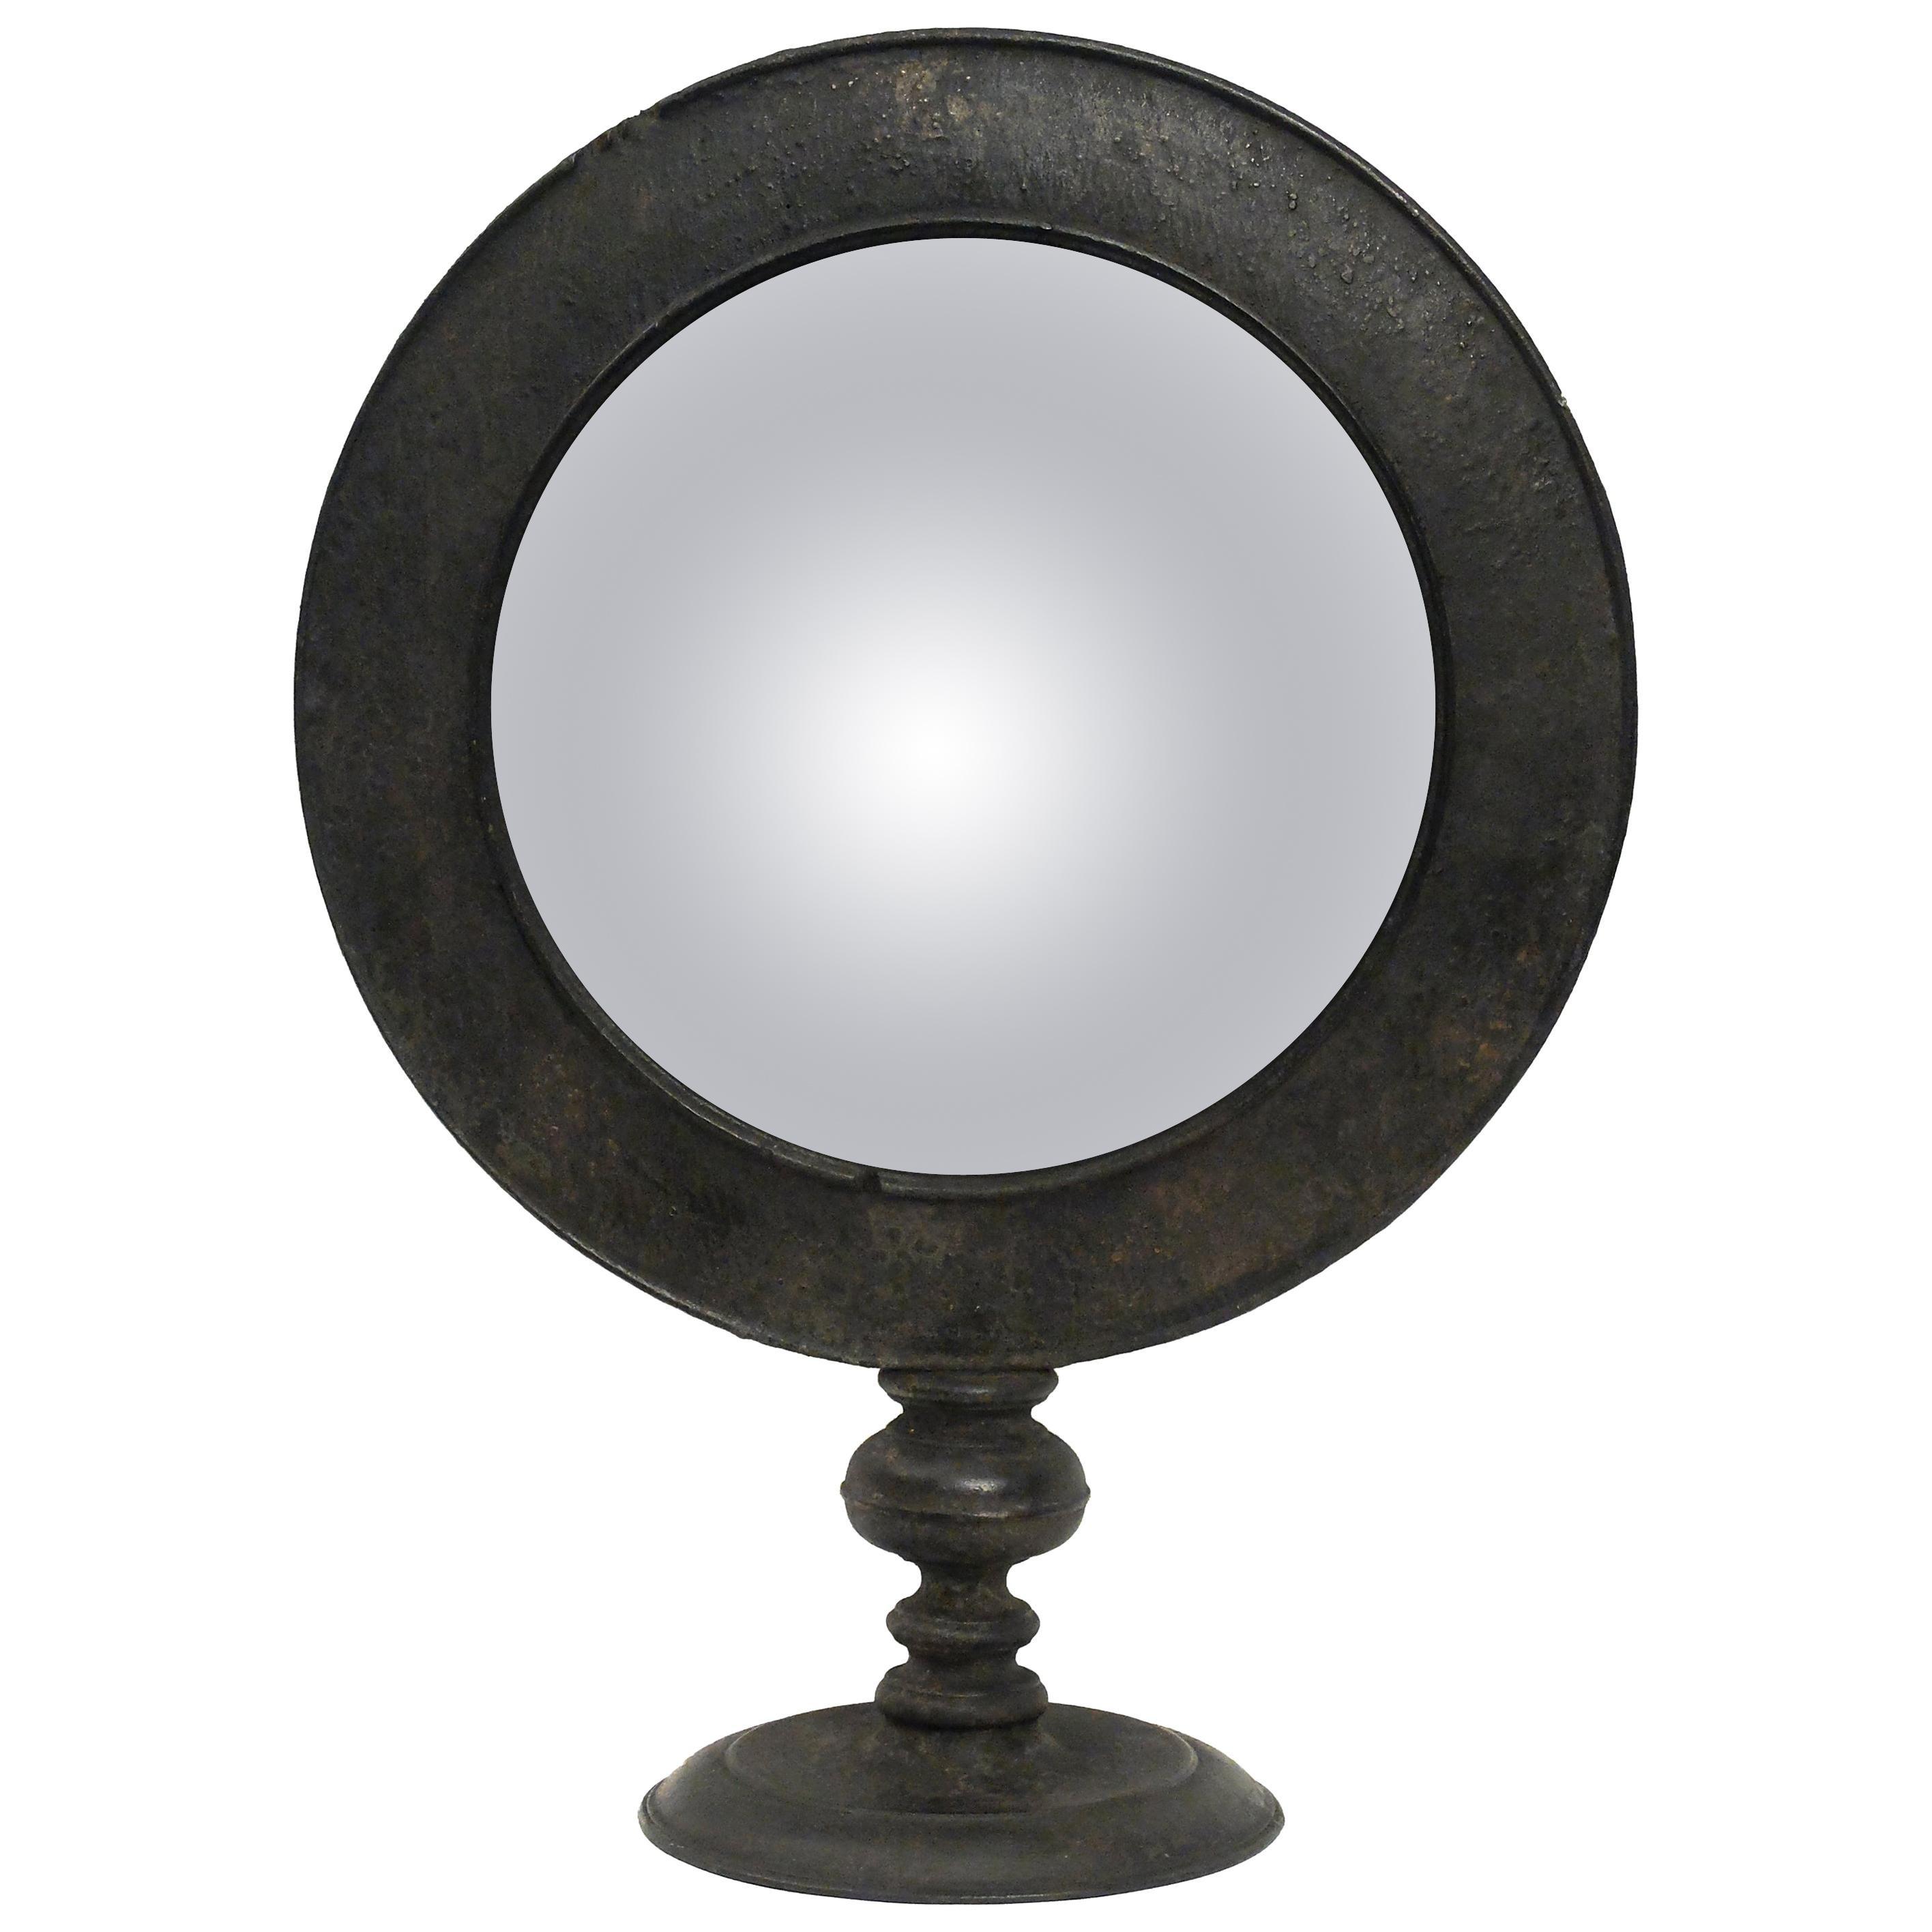 Large Italian Mid-19th Century Convex Table Mirror